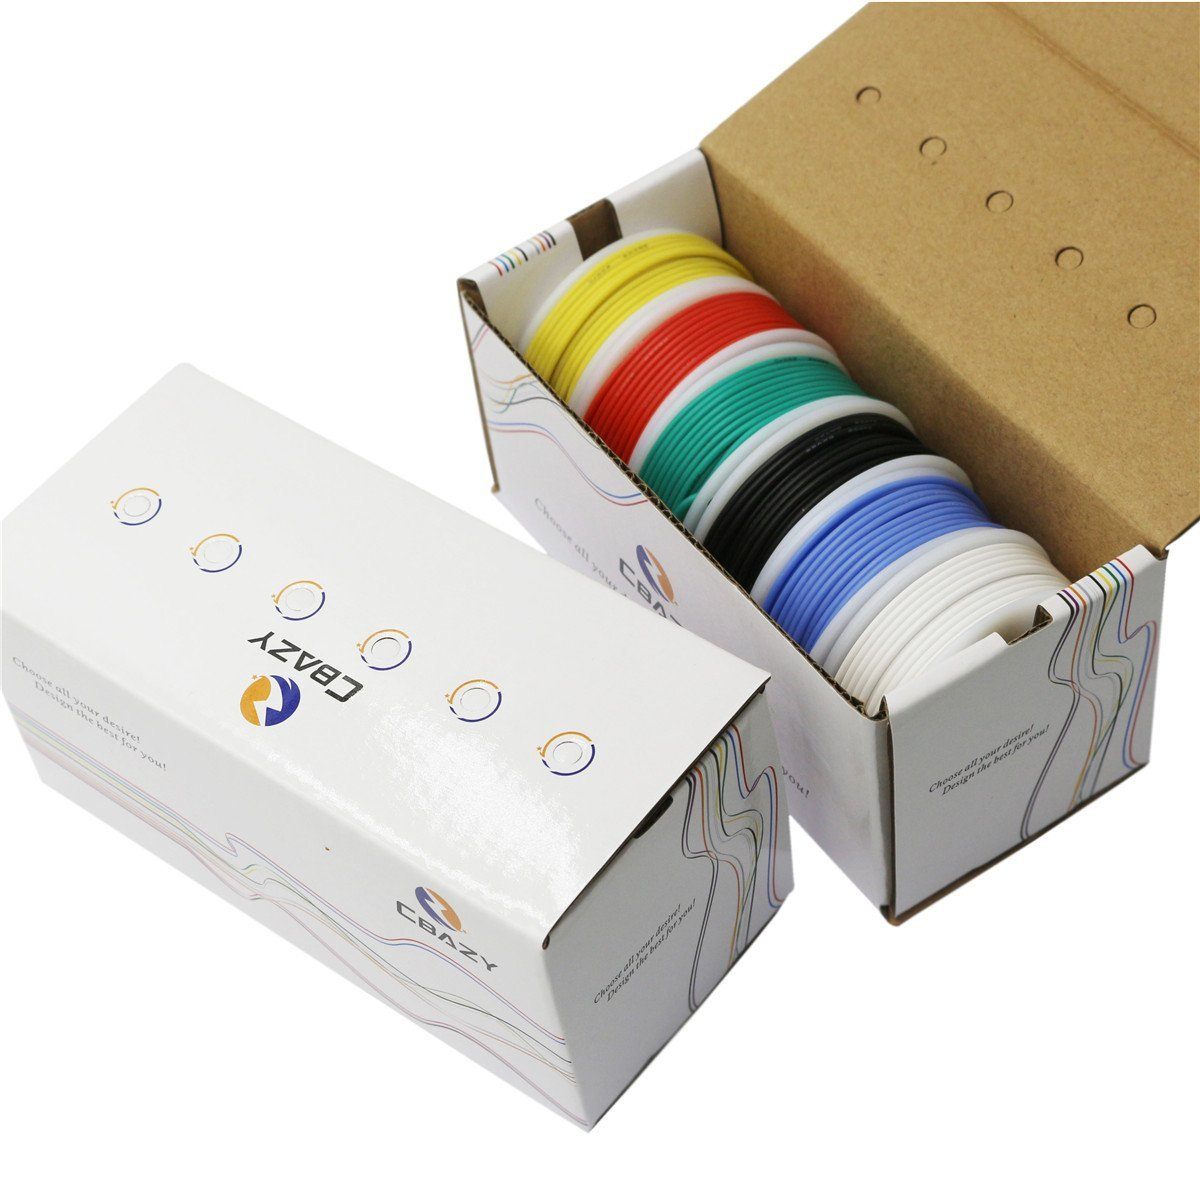 CBAZY Haken up Draht Kit (Litze Kit) 18 Gauge Flexible Silikon gummi ...